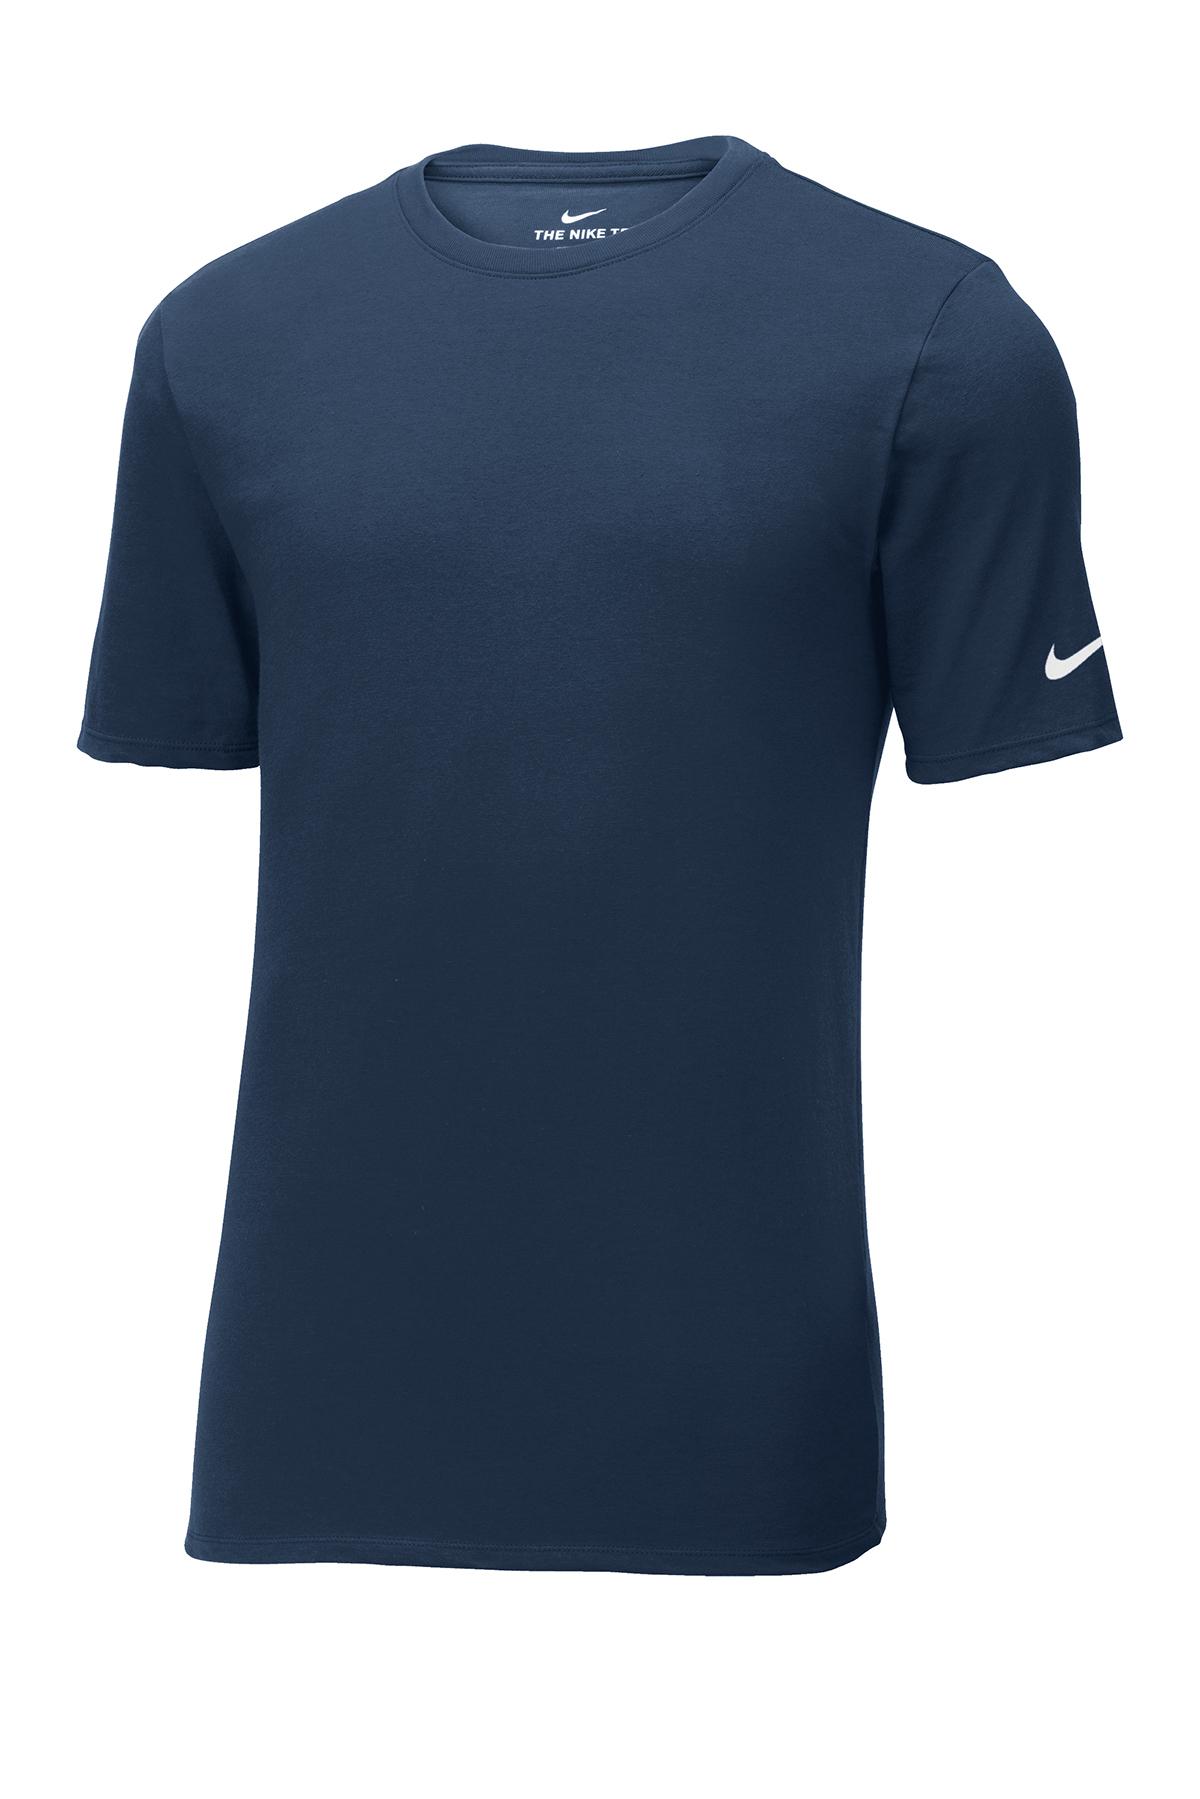 39f6b0aa9 Nike Core Cotton Tee | Ring Spun | T-Shirts | SanMar